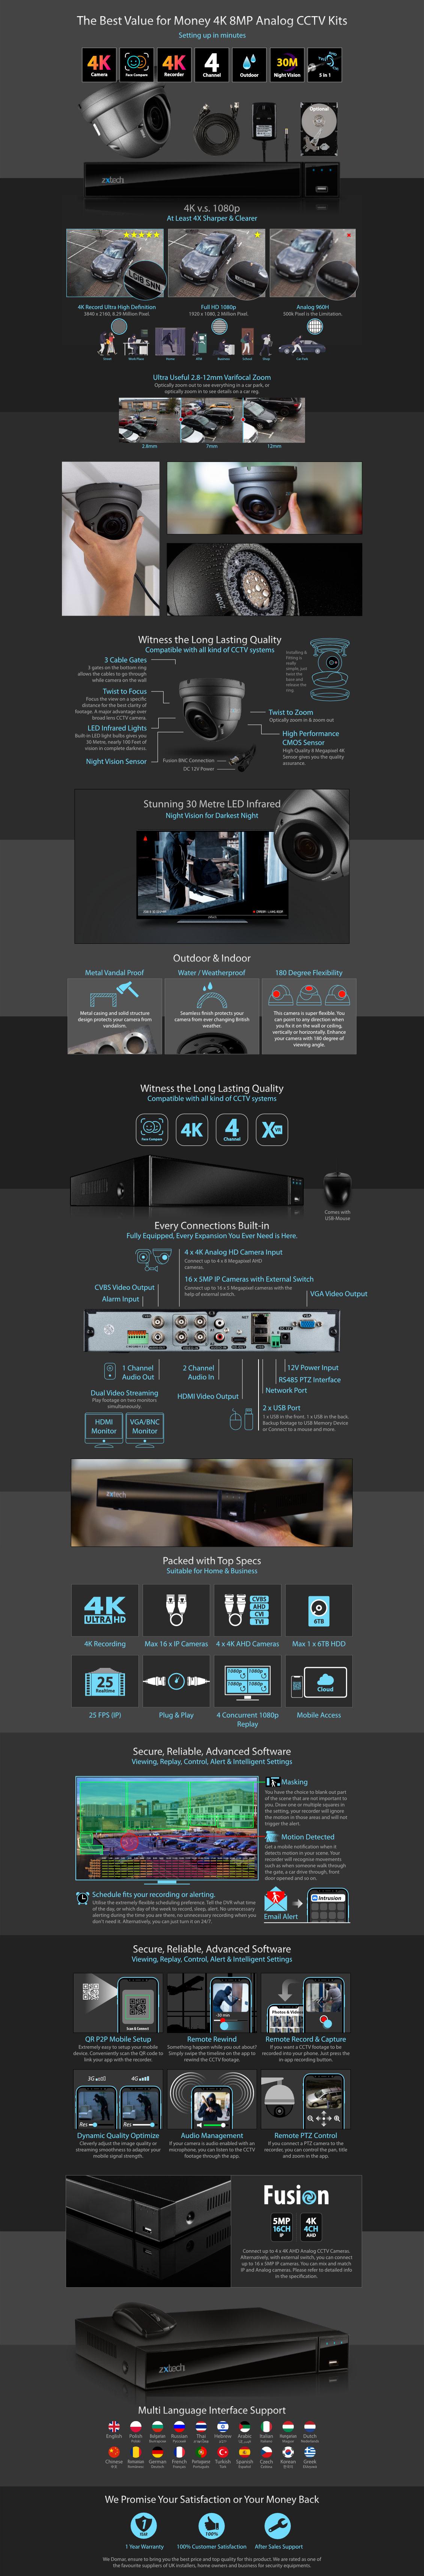 Zxtech 3x 8MP 4K-Lite UHD 30M Night Vision 2.8-12mm Varifocal Dome Cameras 4CH DVR CCTV Kit | AX3E4Z